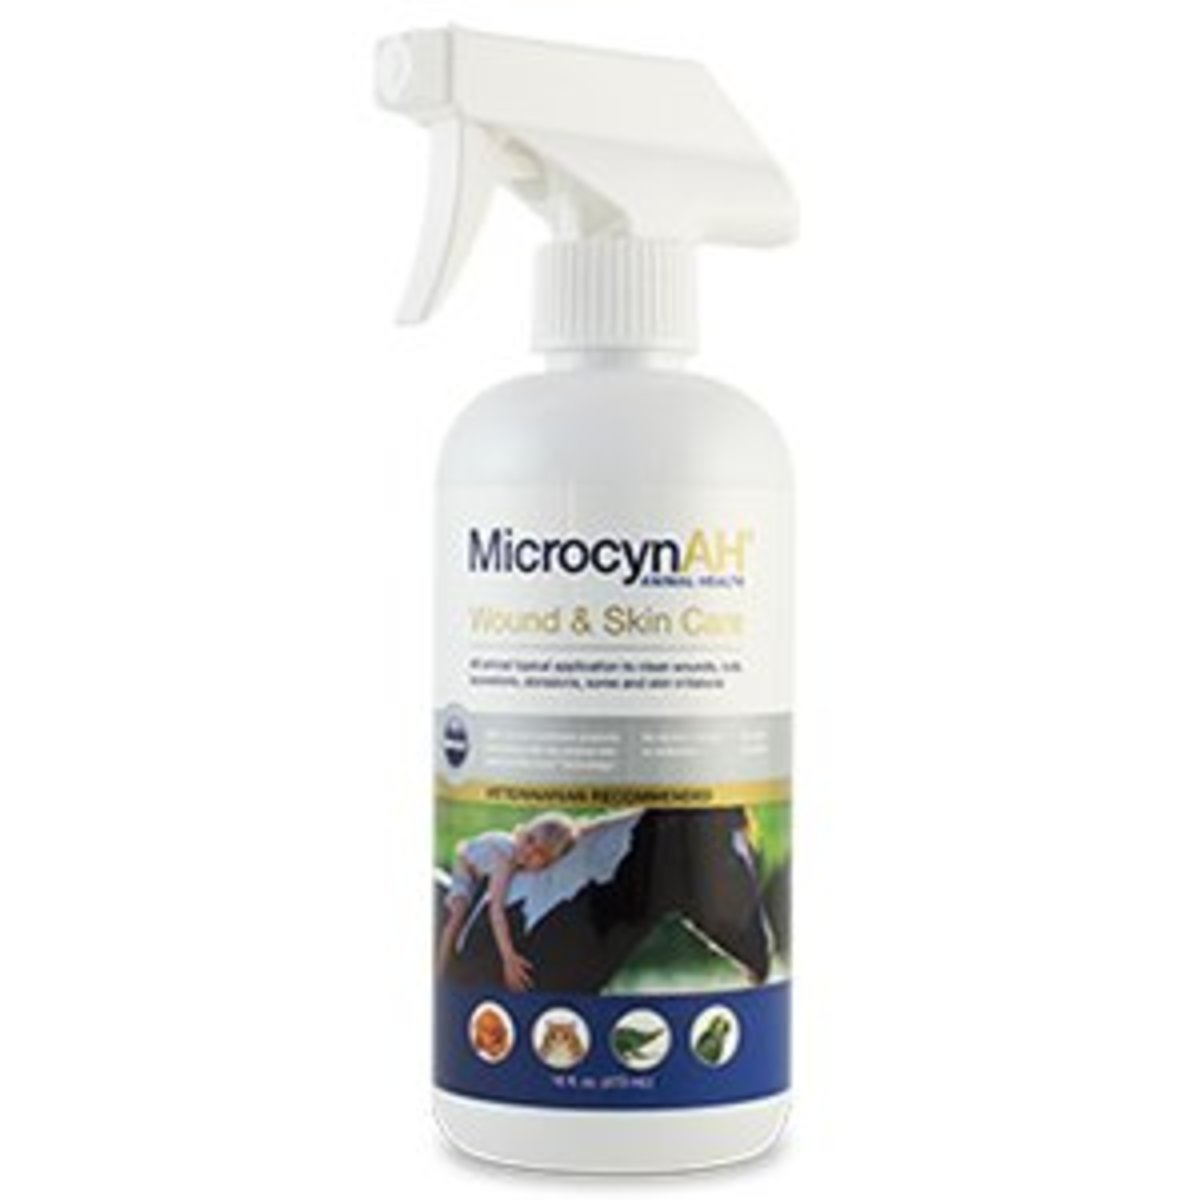 Wound & Skin Care Liquid Spray (16oz / 500ml) #M1008